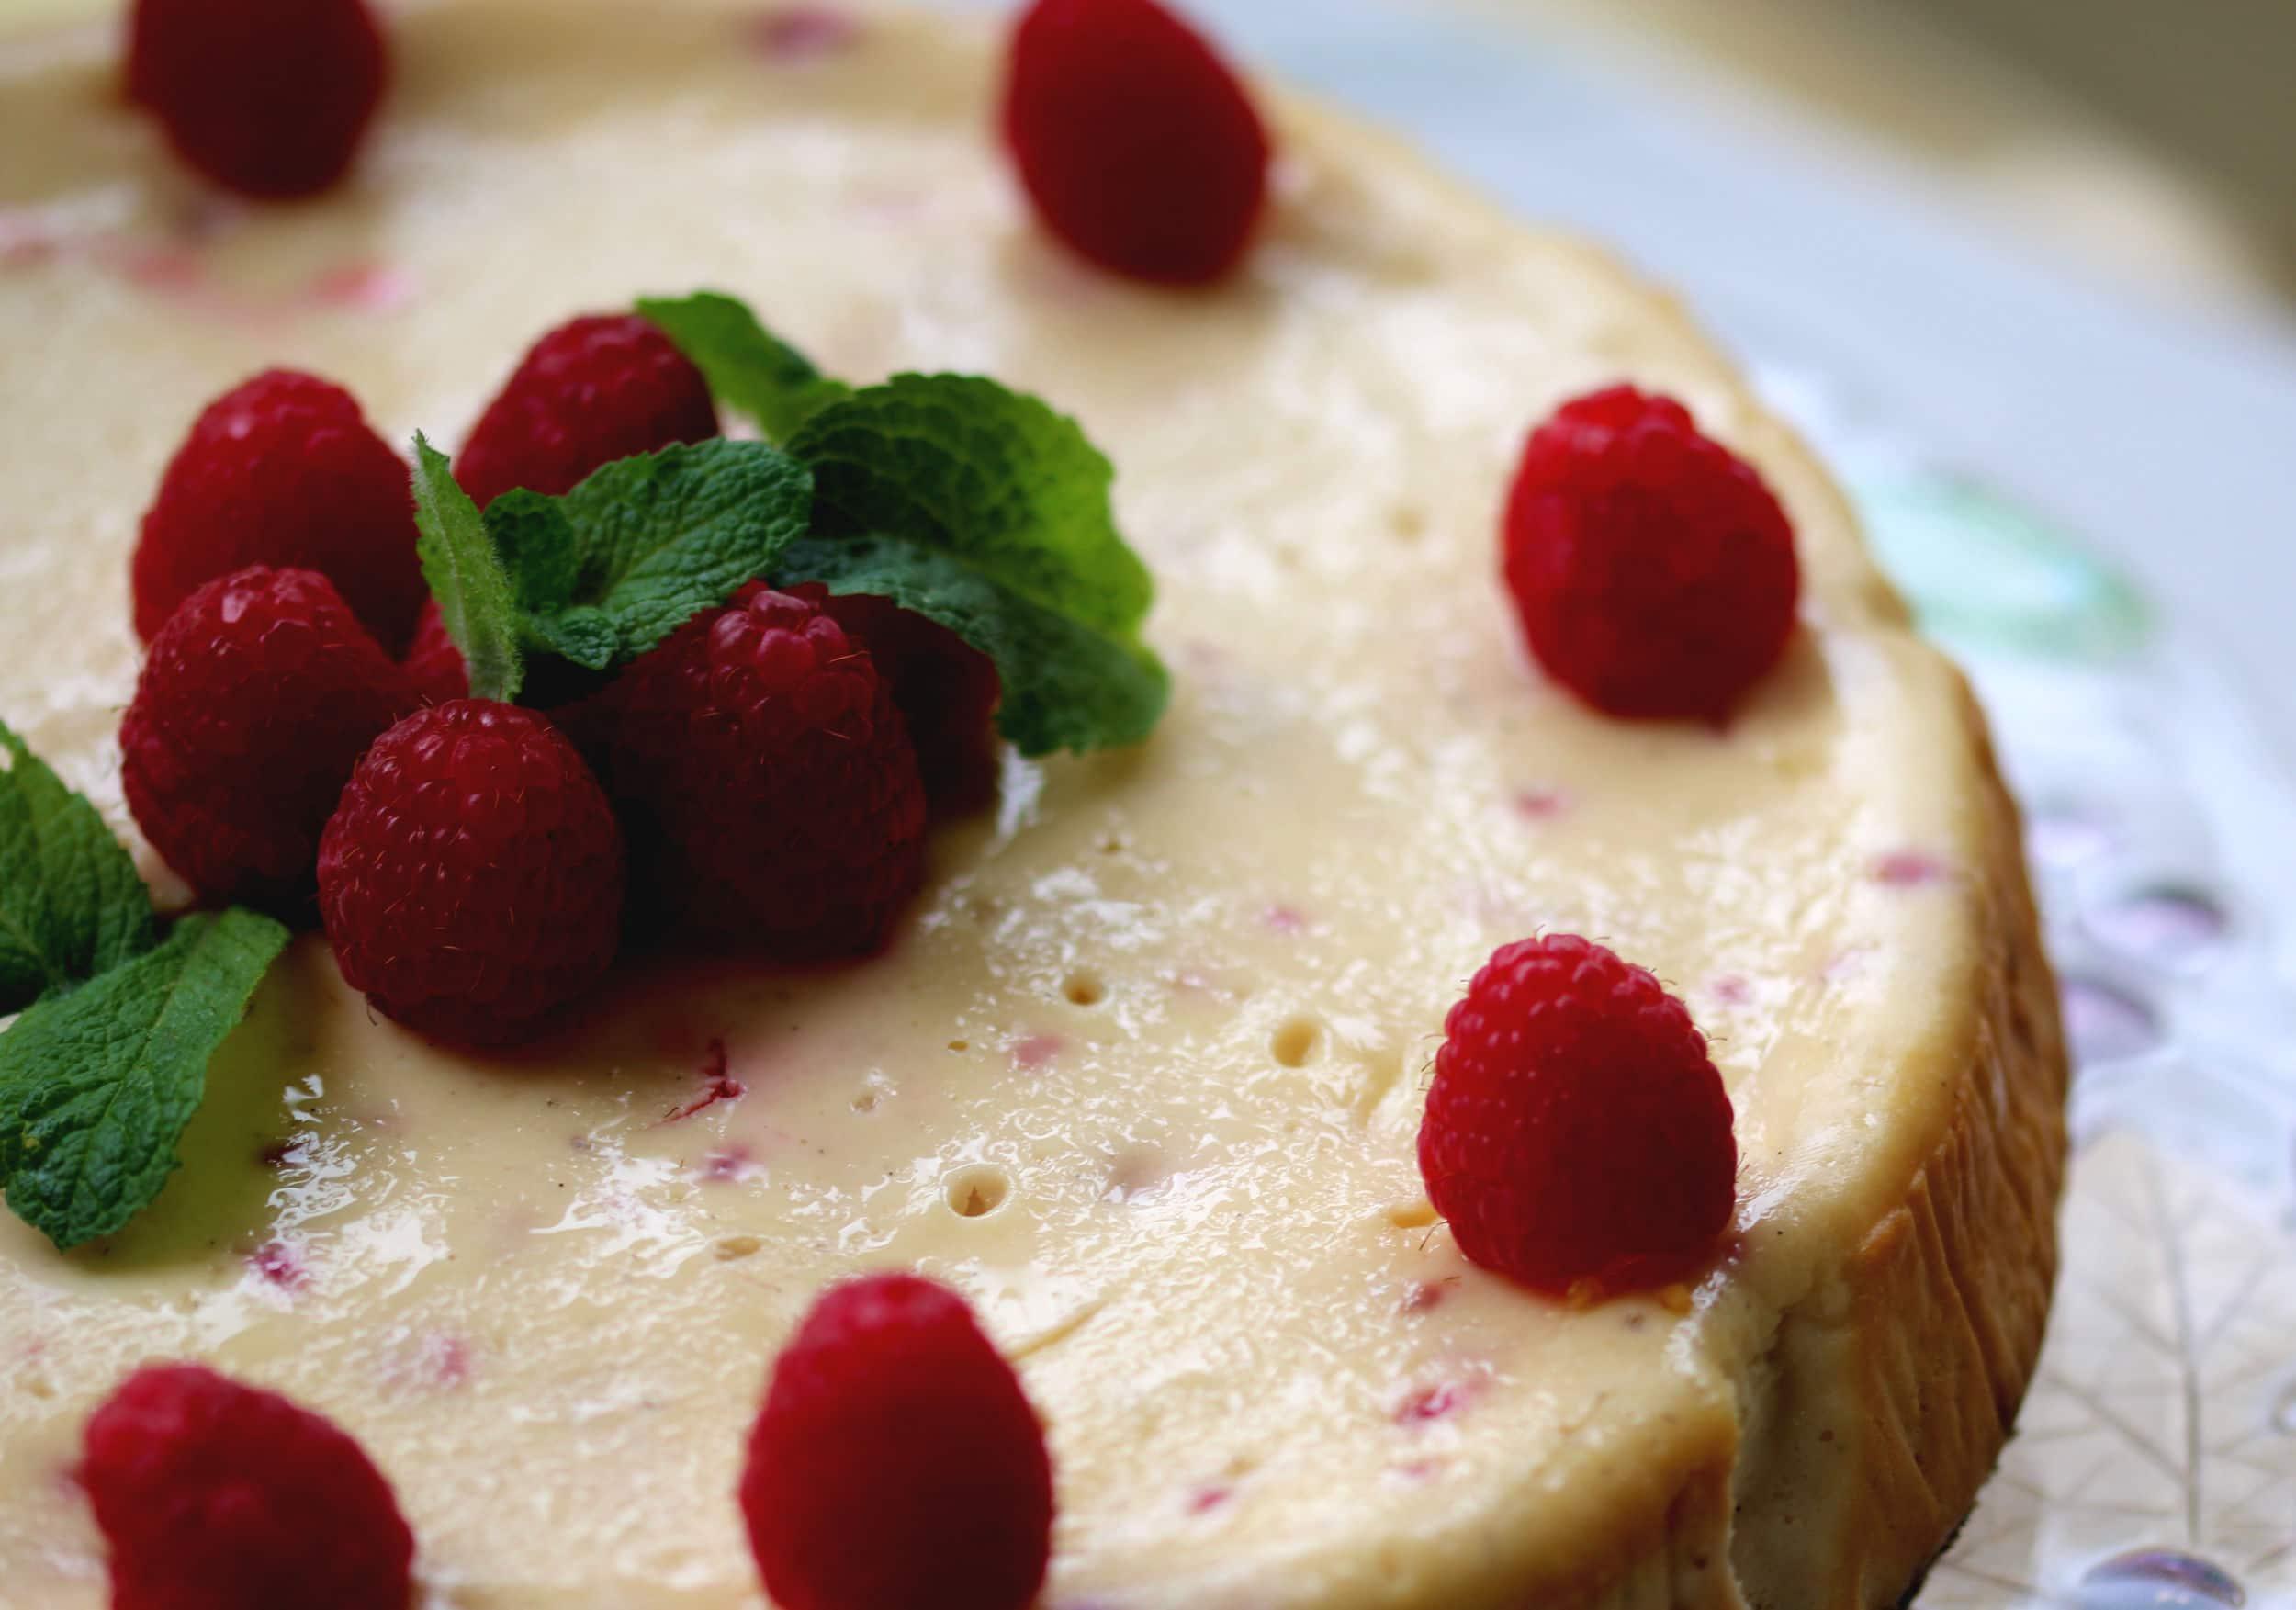 Gluten free baked Raspberry Cheesecake